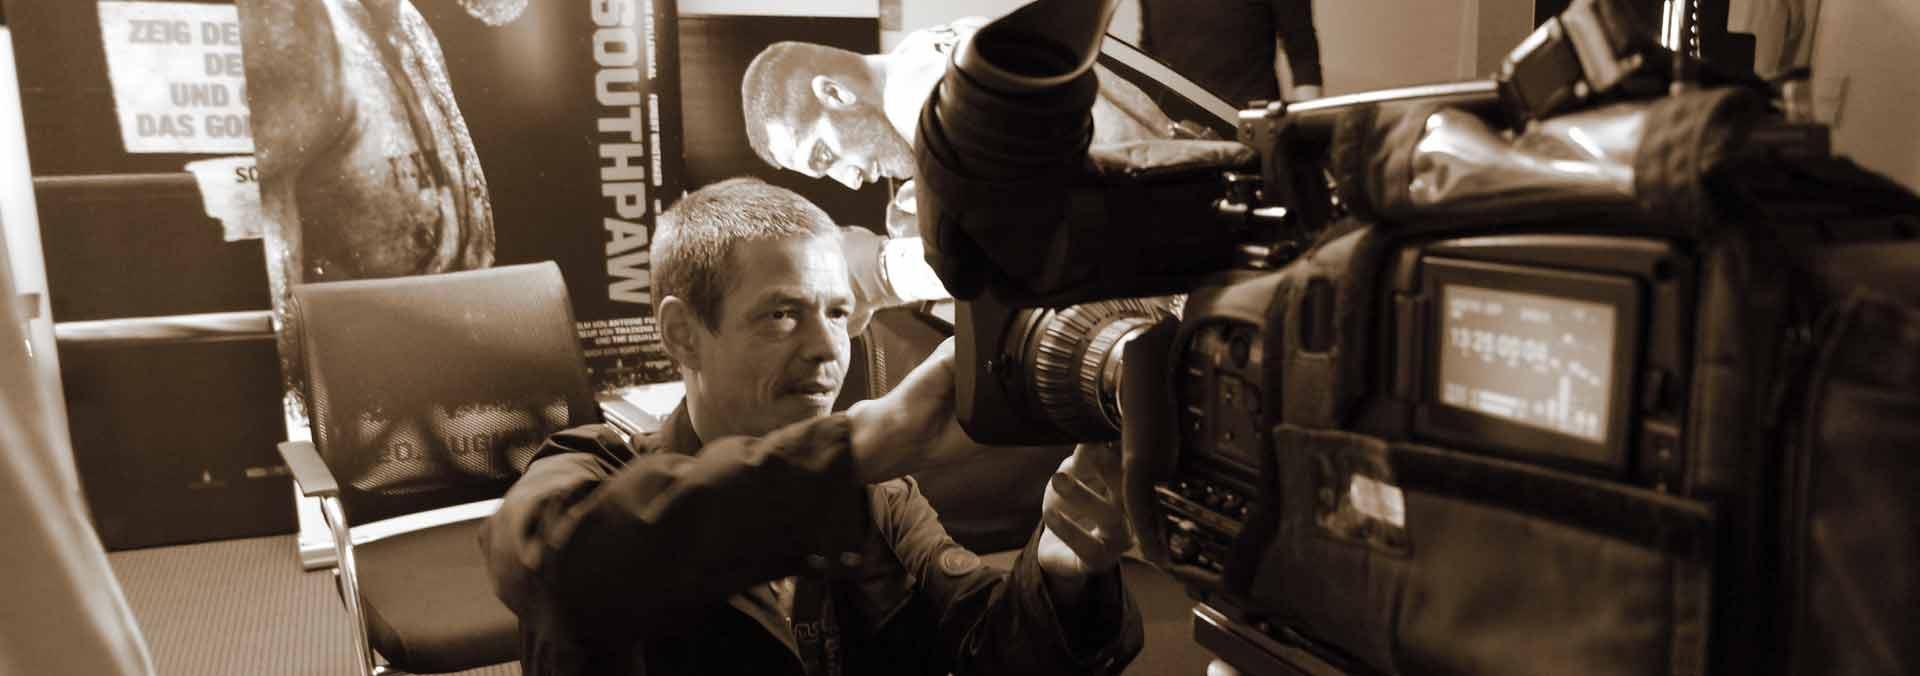 Imagefilm allmediachannels at Tobis film